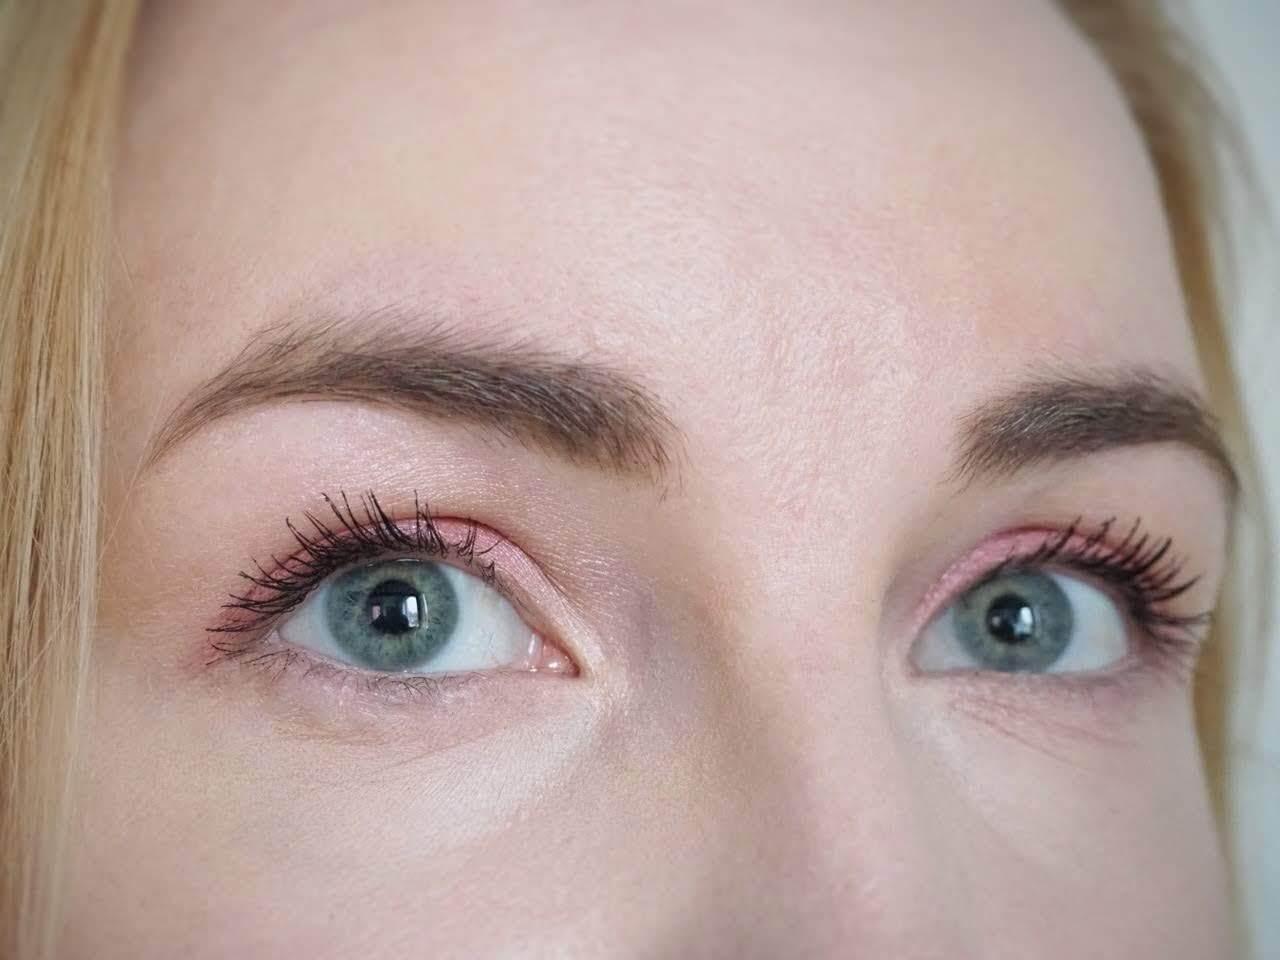 madara silmämeikki